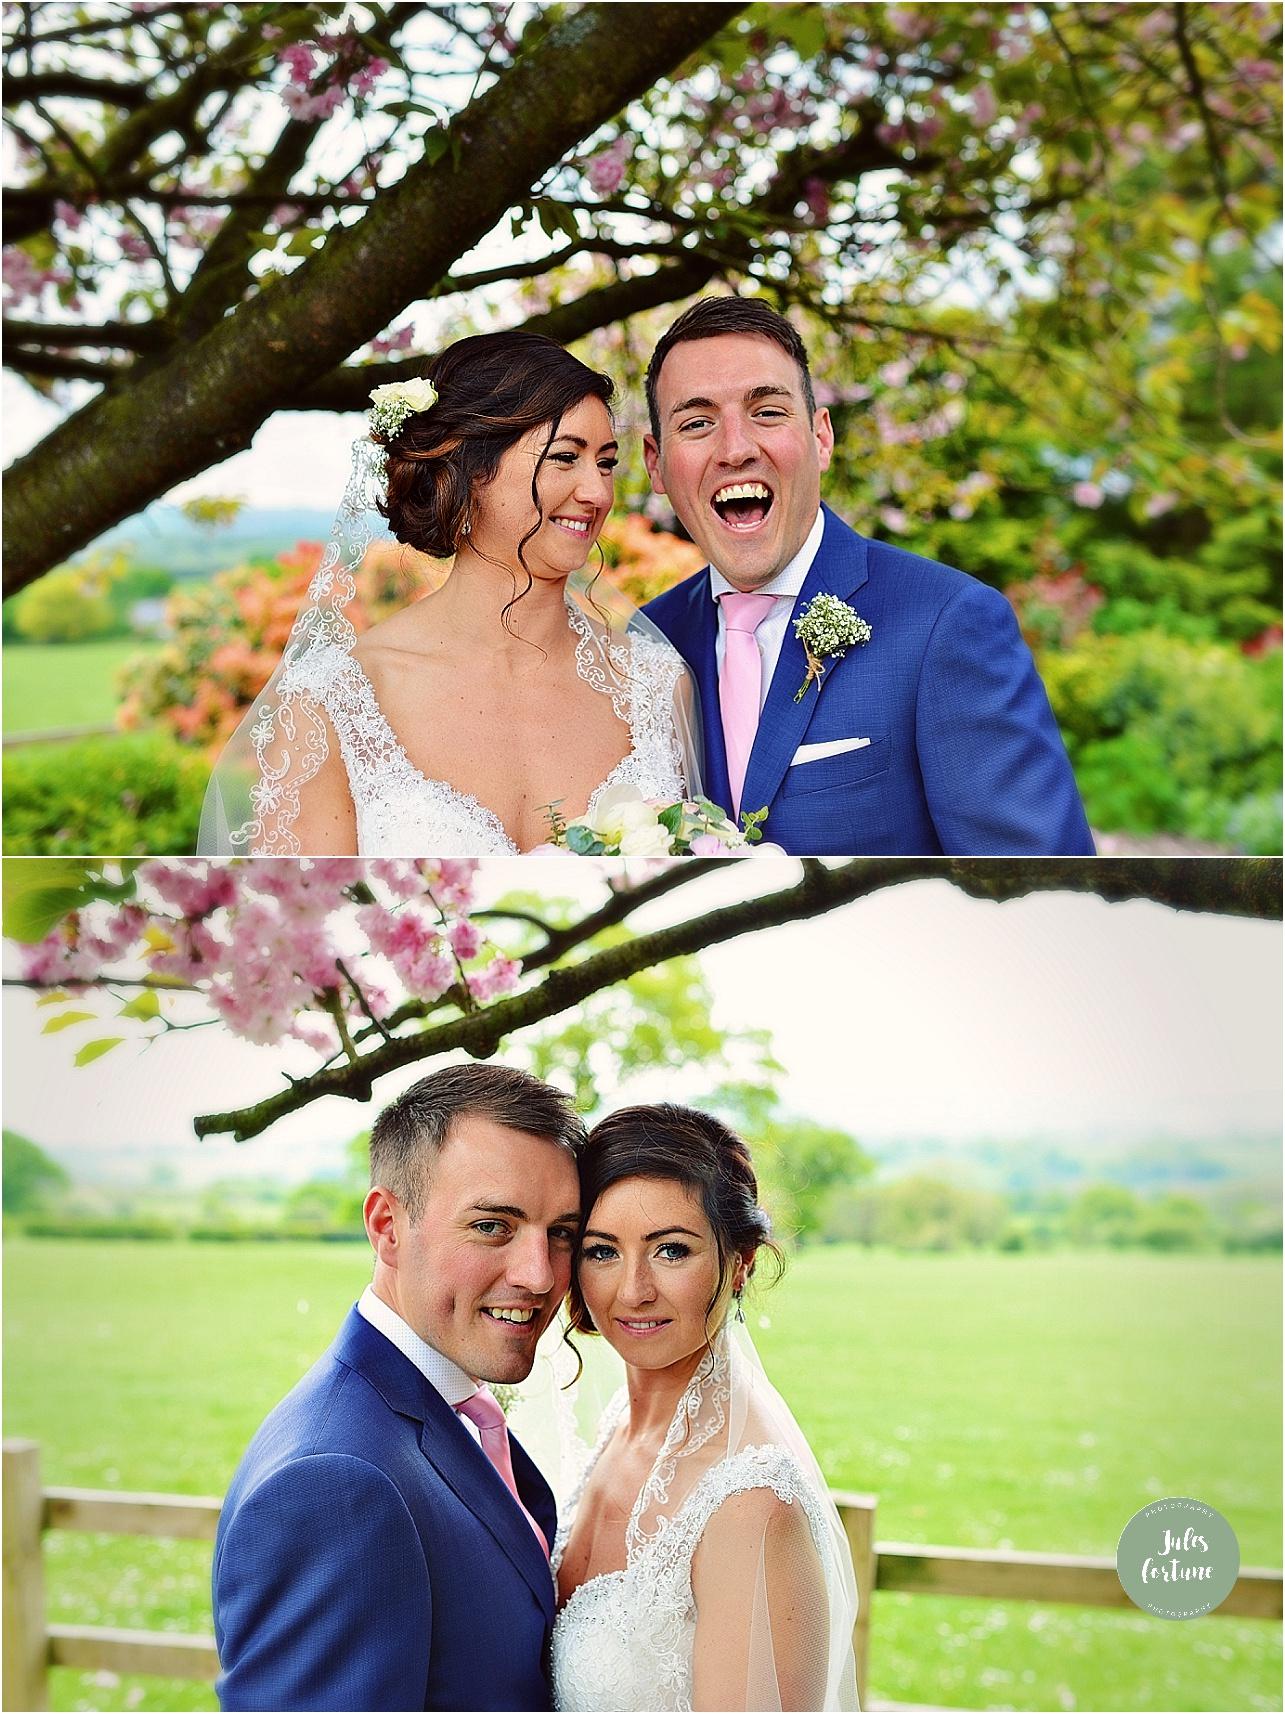 Shireburn Arms Weddings Clitheroe